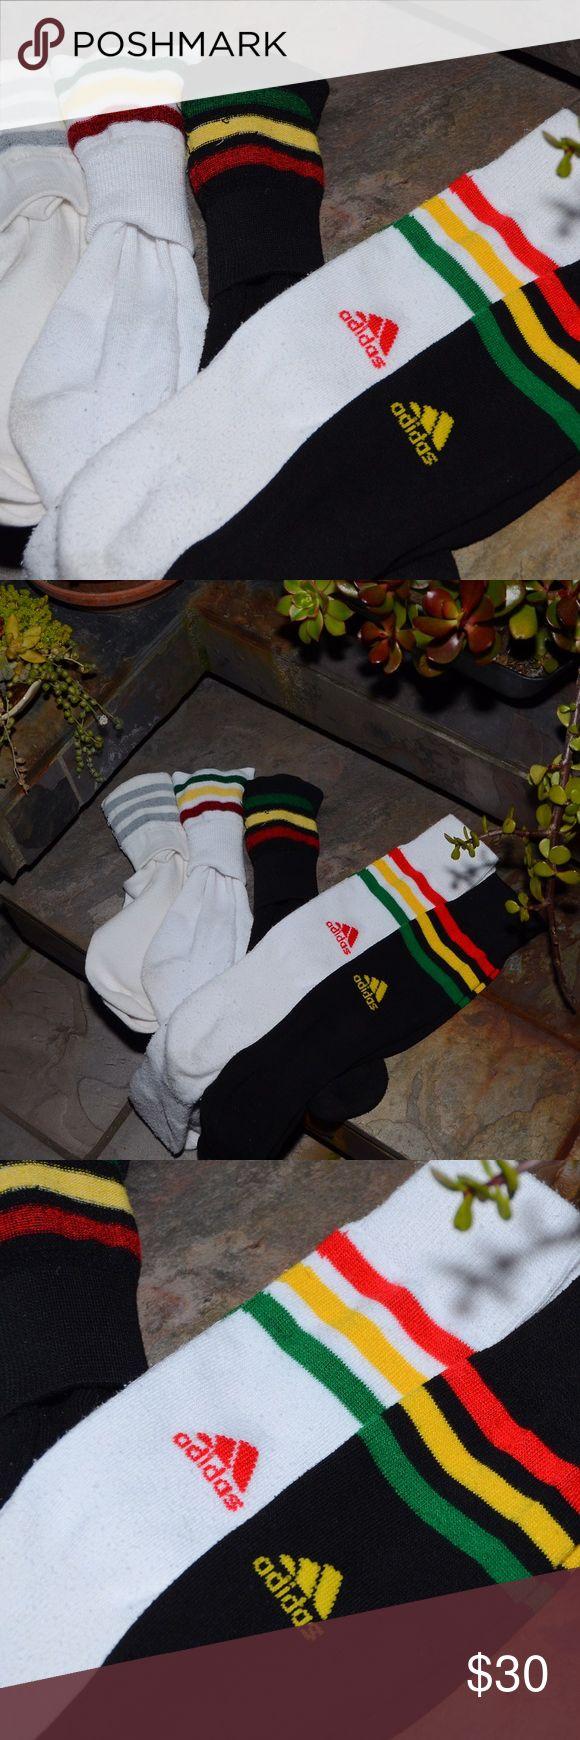 Tall Rasta Adidas Sock Lot Bundle Great tall socks, Rasta print and stripes, black and white socks, men's small or women's. Each pair was originally $17.99, barely worn socks. Adidas Other